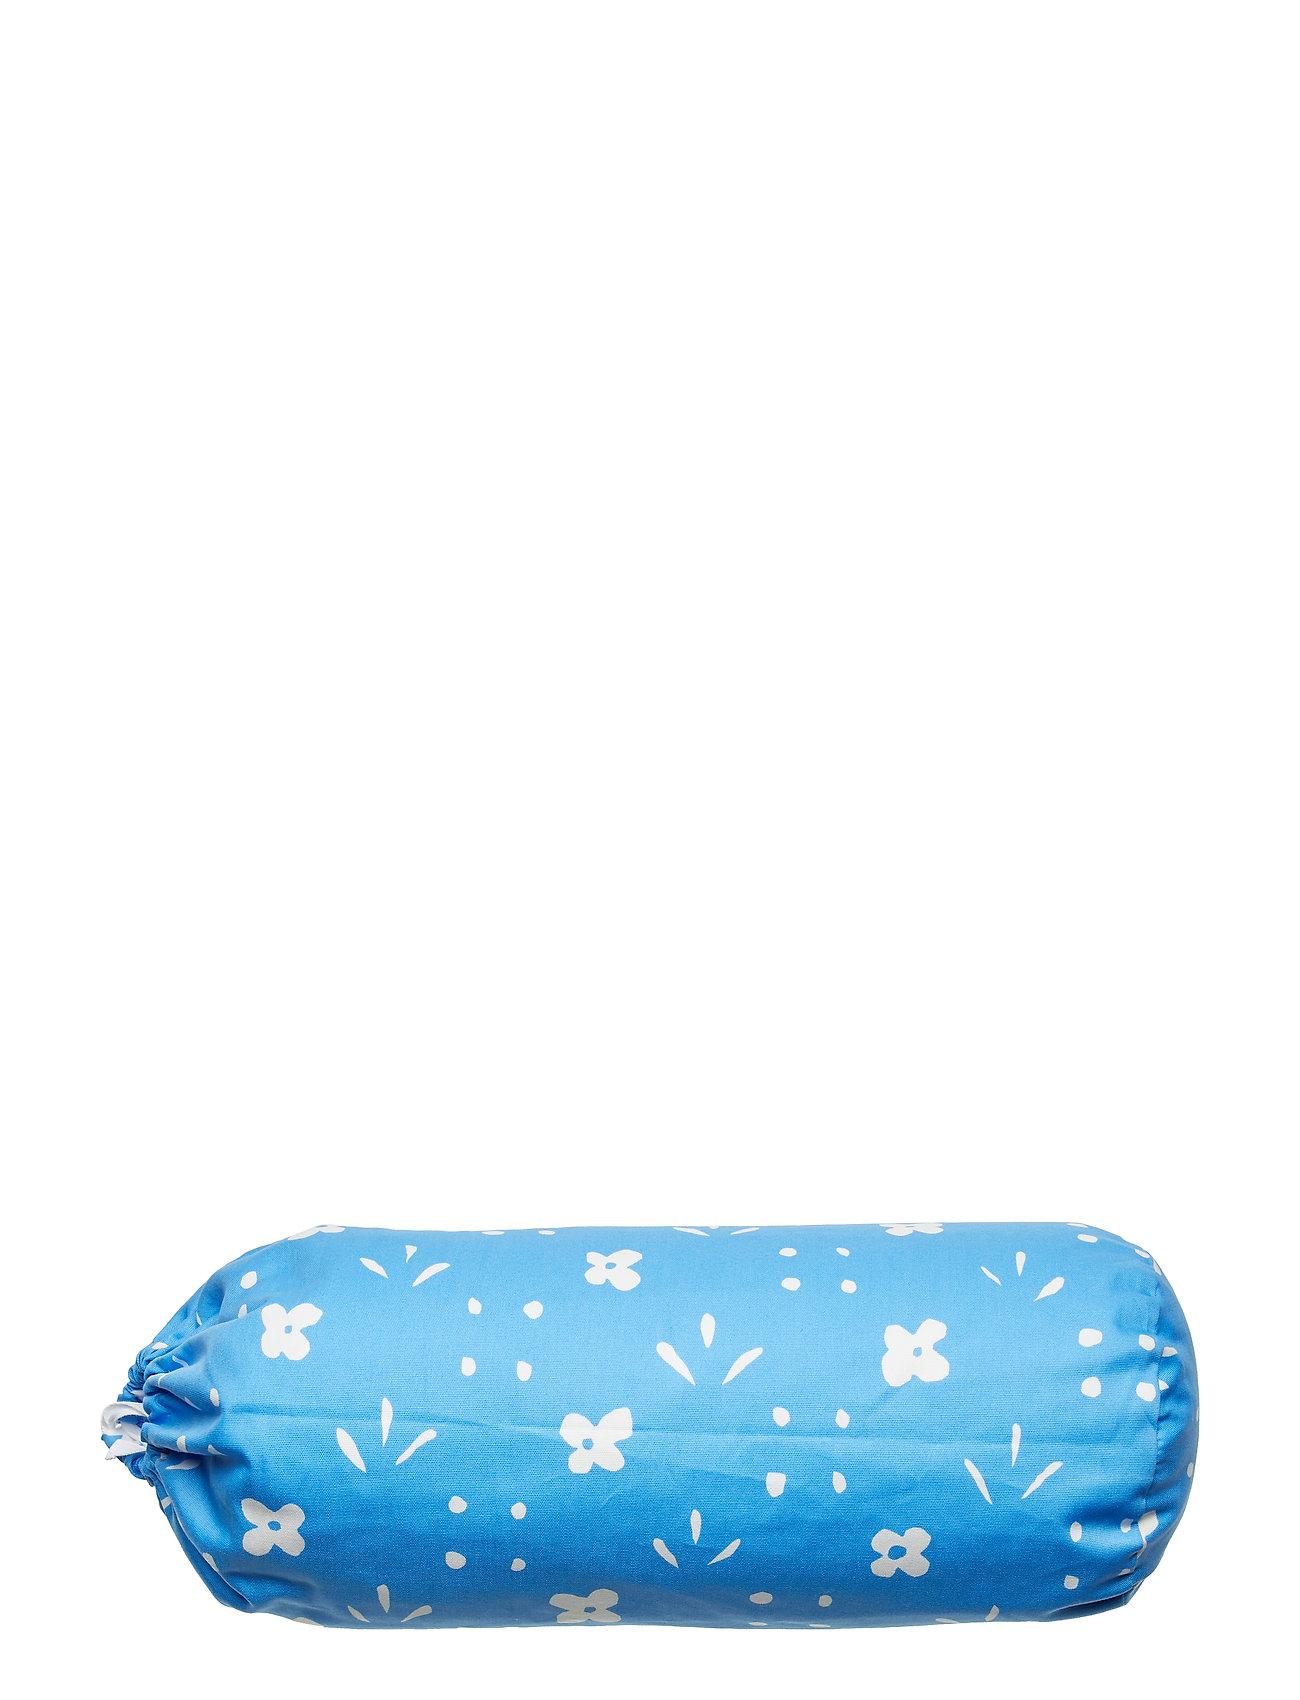 Marimekko Home KUKKAKETO PILLOW - BLUE, WHITE